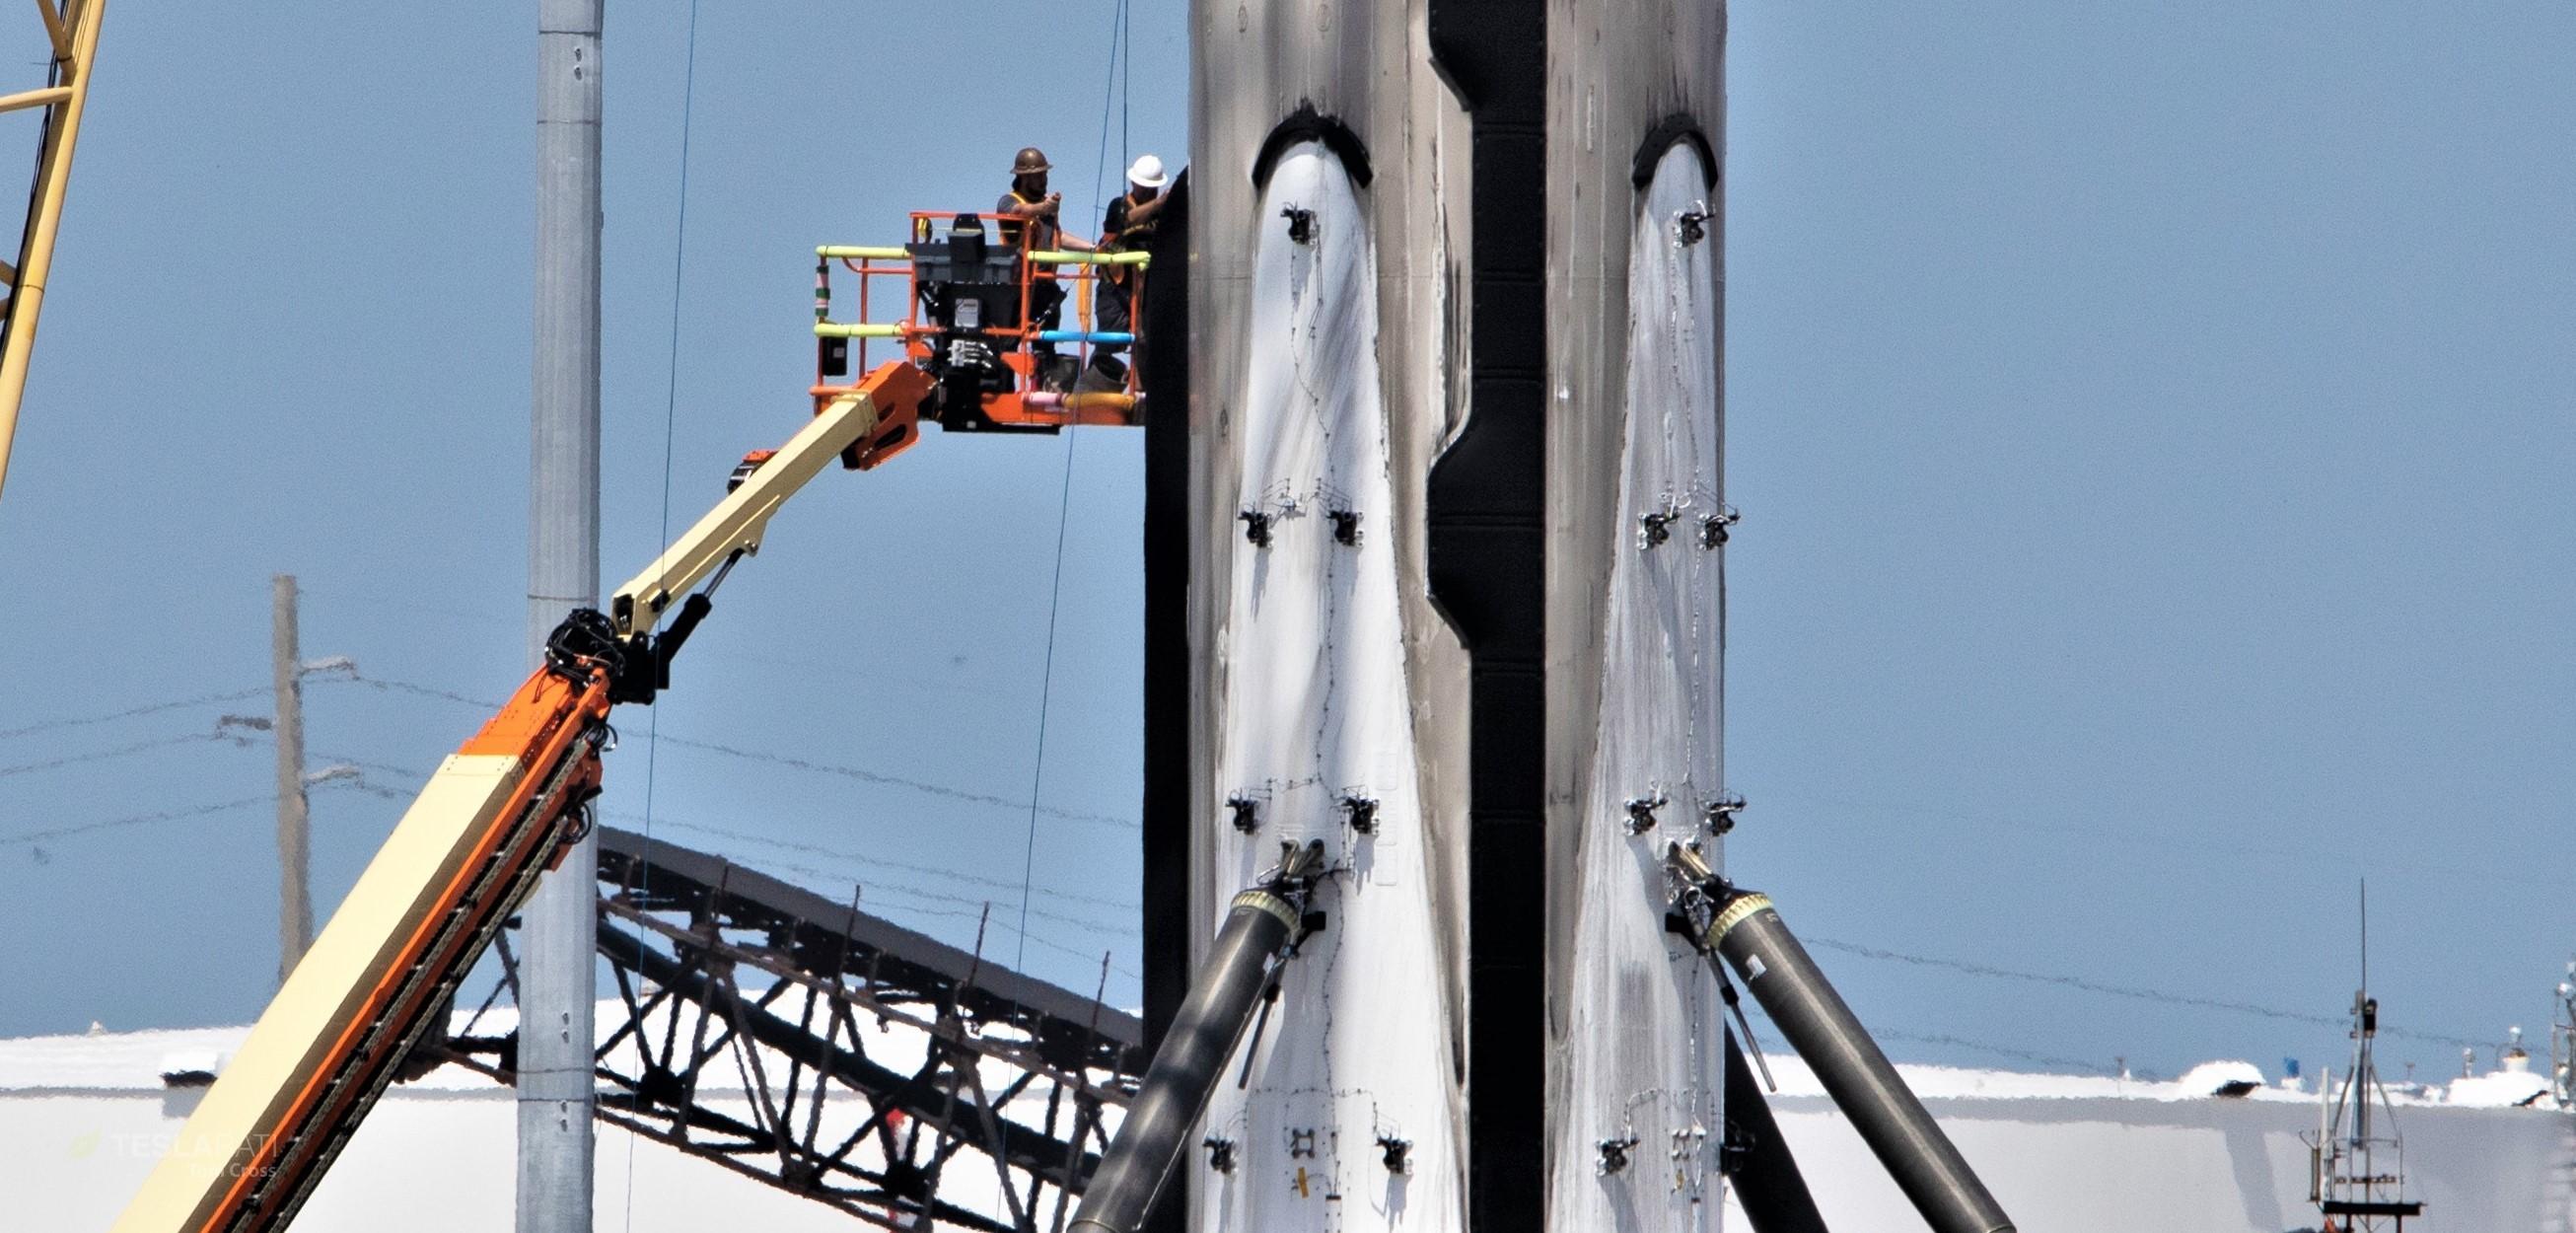 Falcon 9 b1056 leg retraction 1 of 4 050719 (Tom Cross) 2 crop